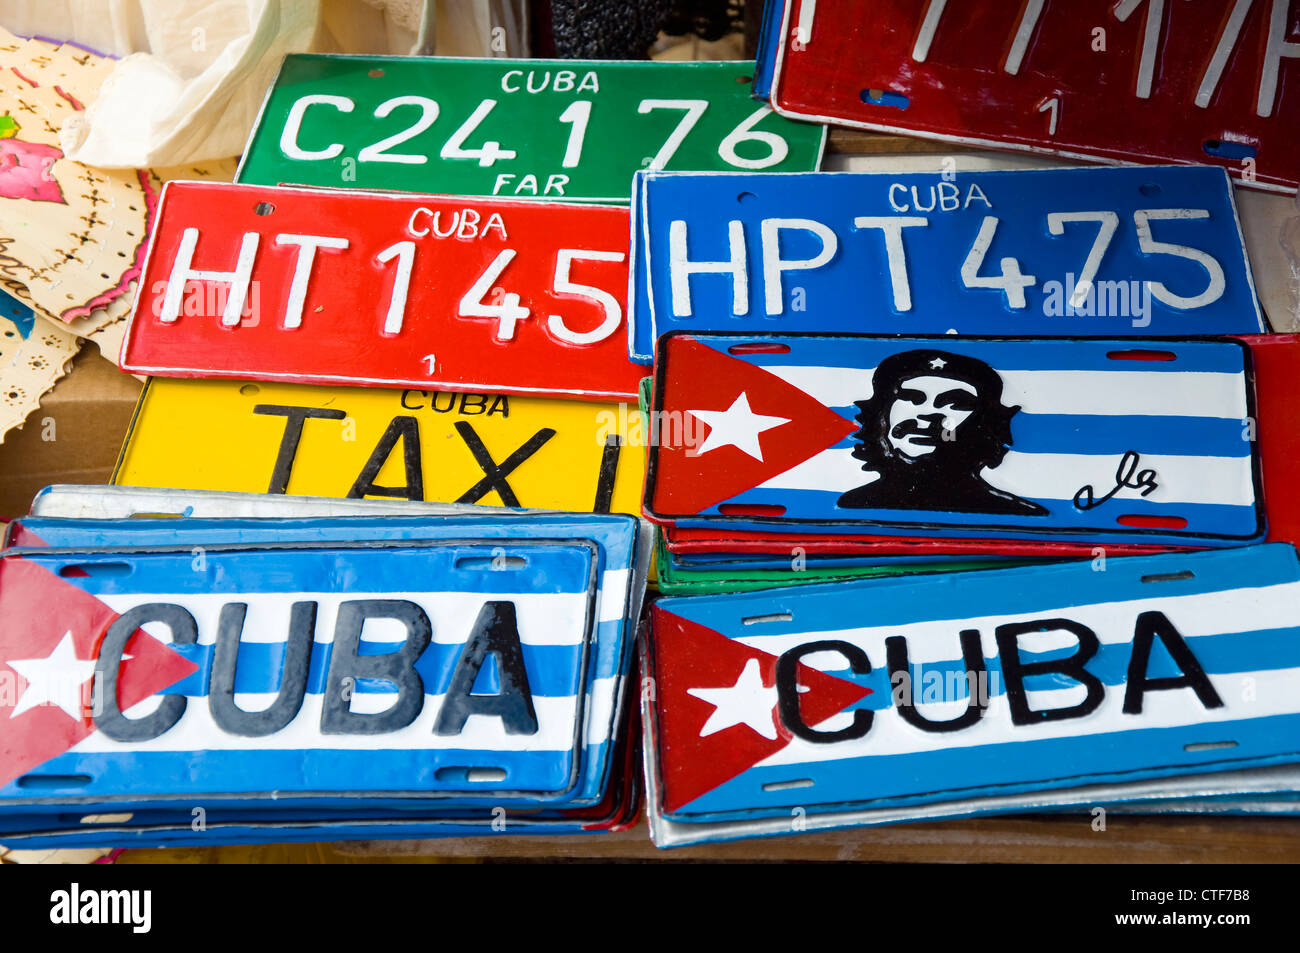 Cuban License Plates, Trinidad, Cuba - Stock Image